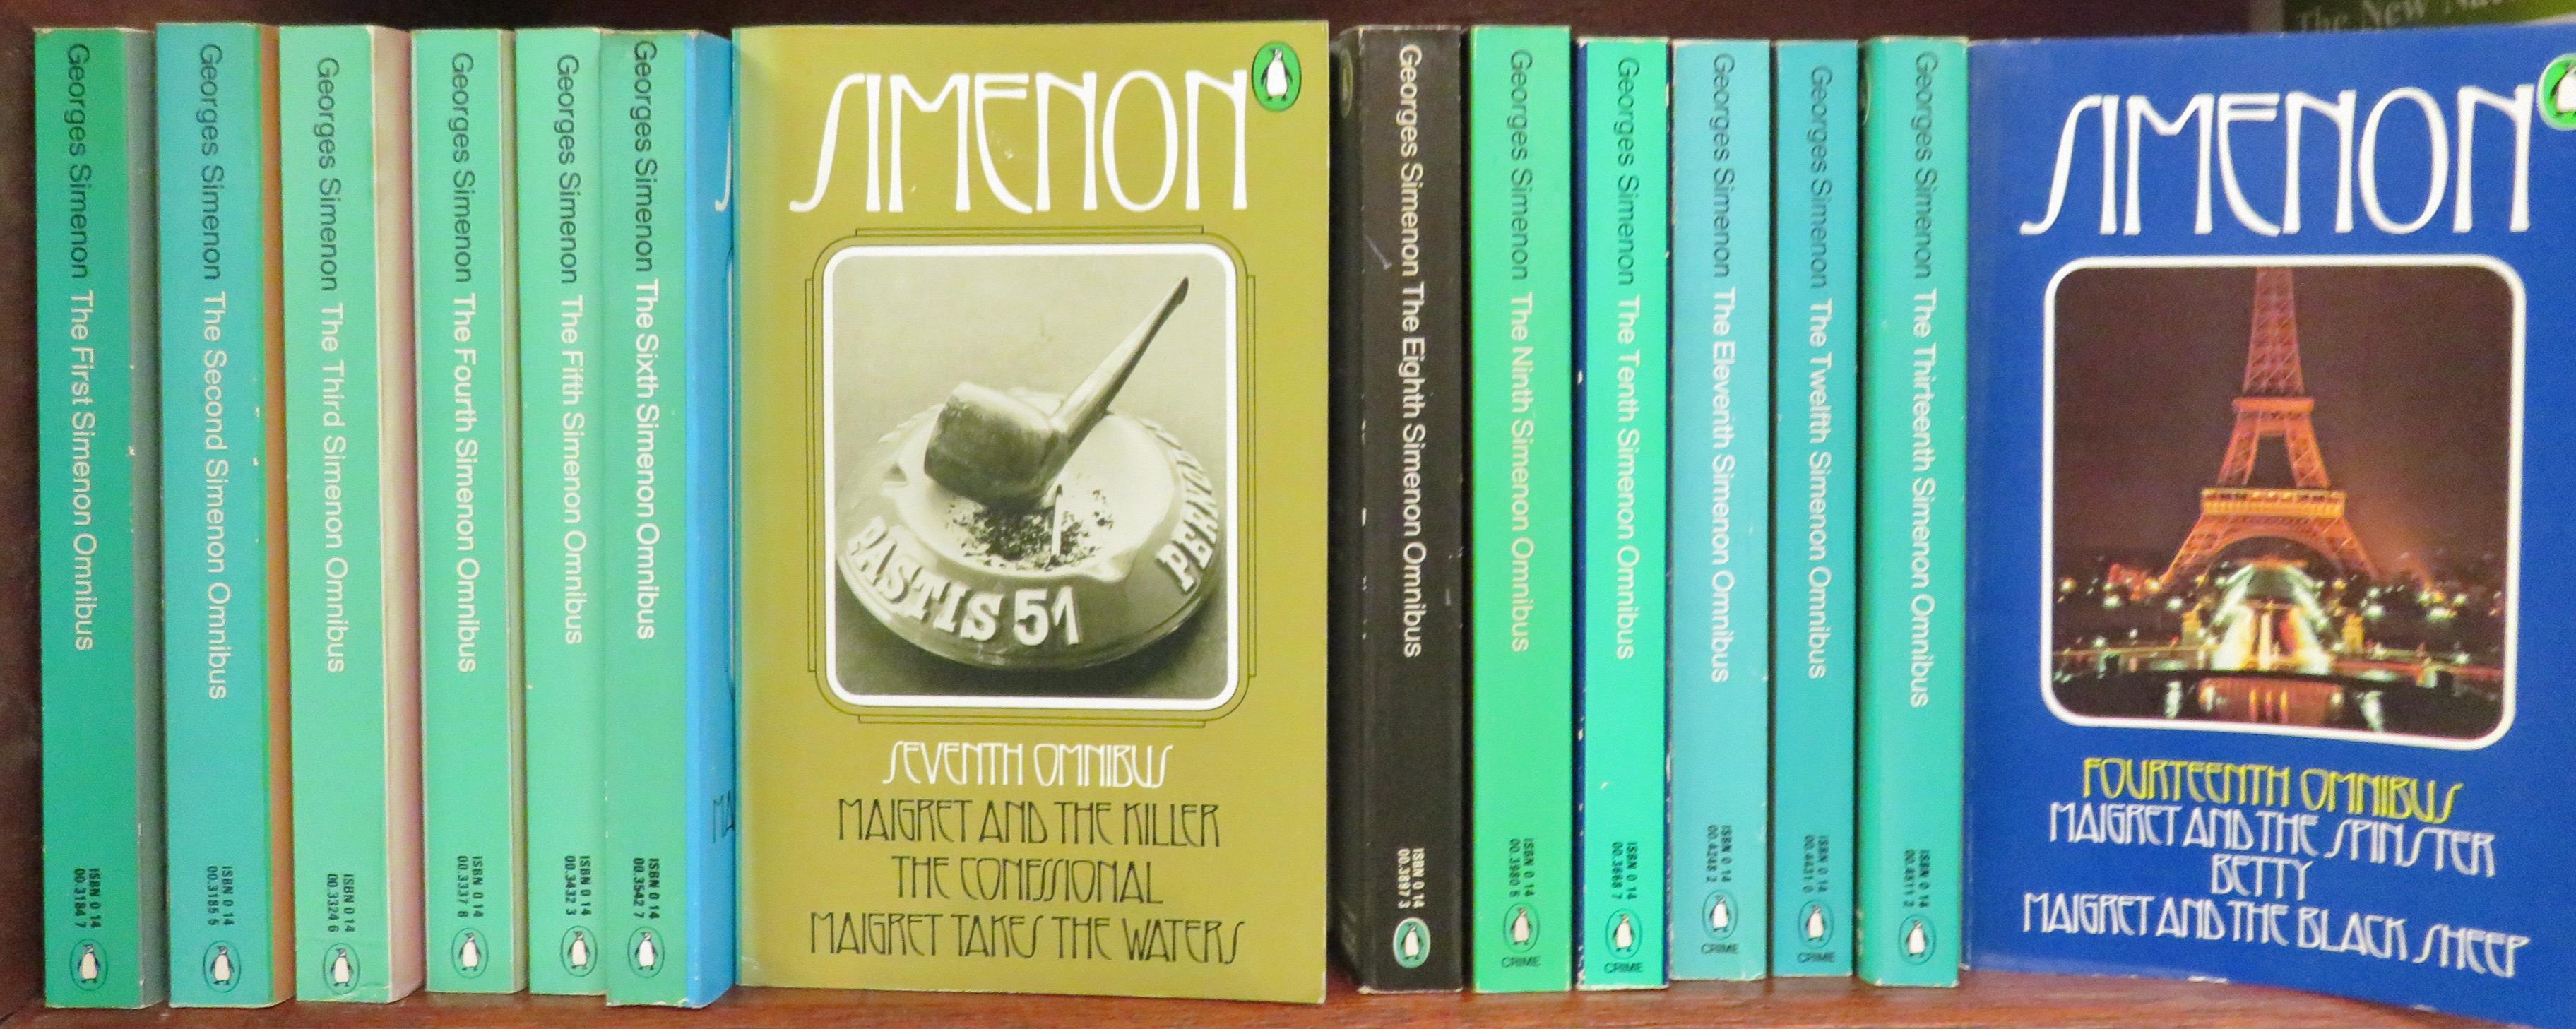 Simenon Omnibus collection complete fourteen volume set